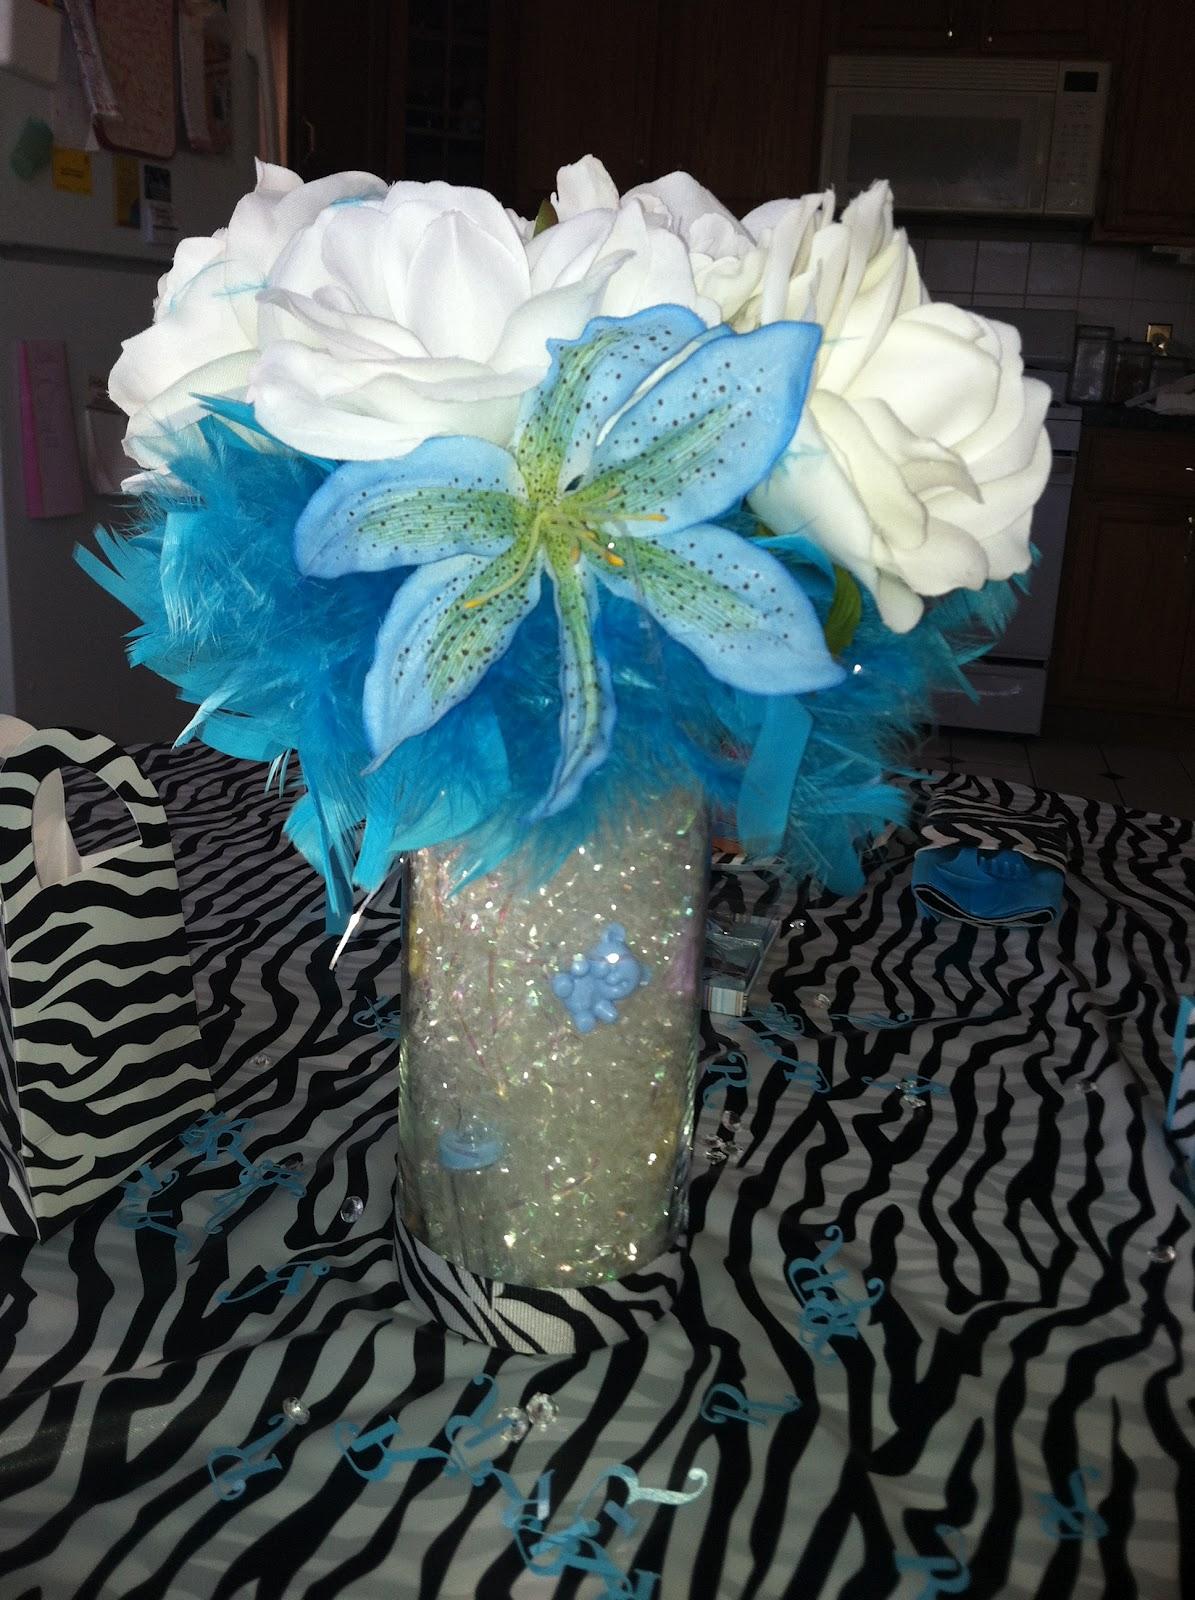 Penn foster bridal consultant homework help